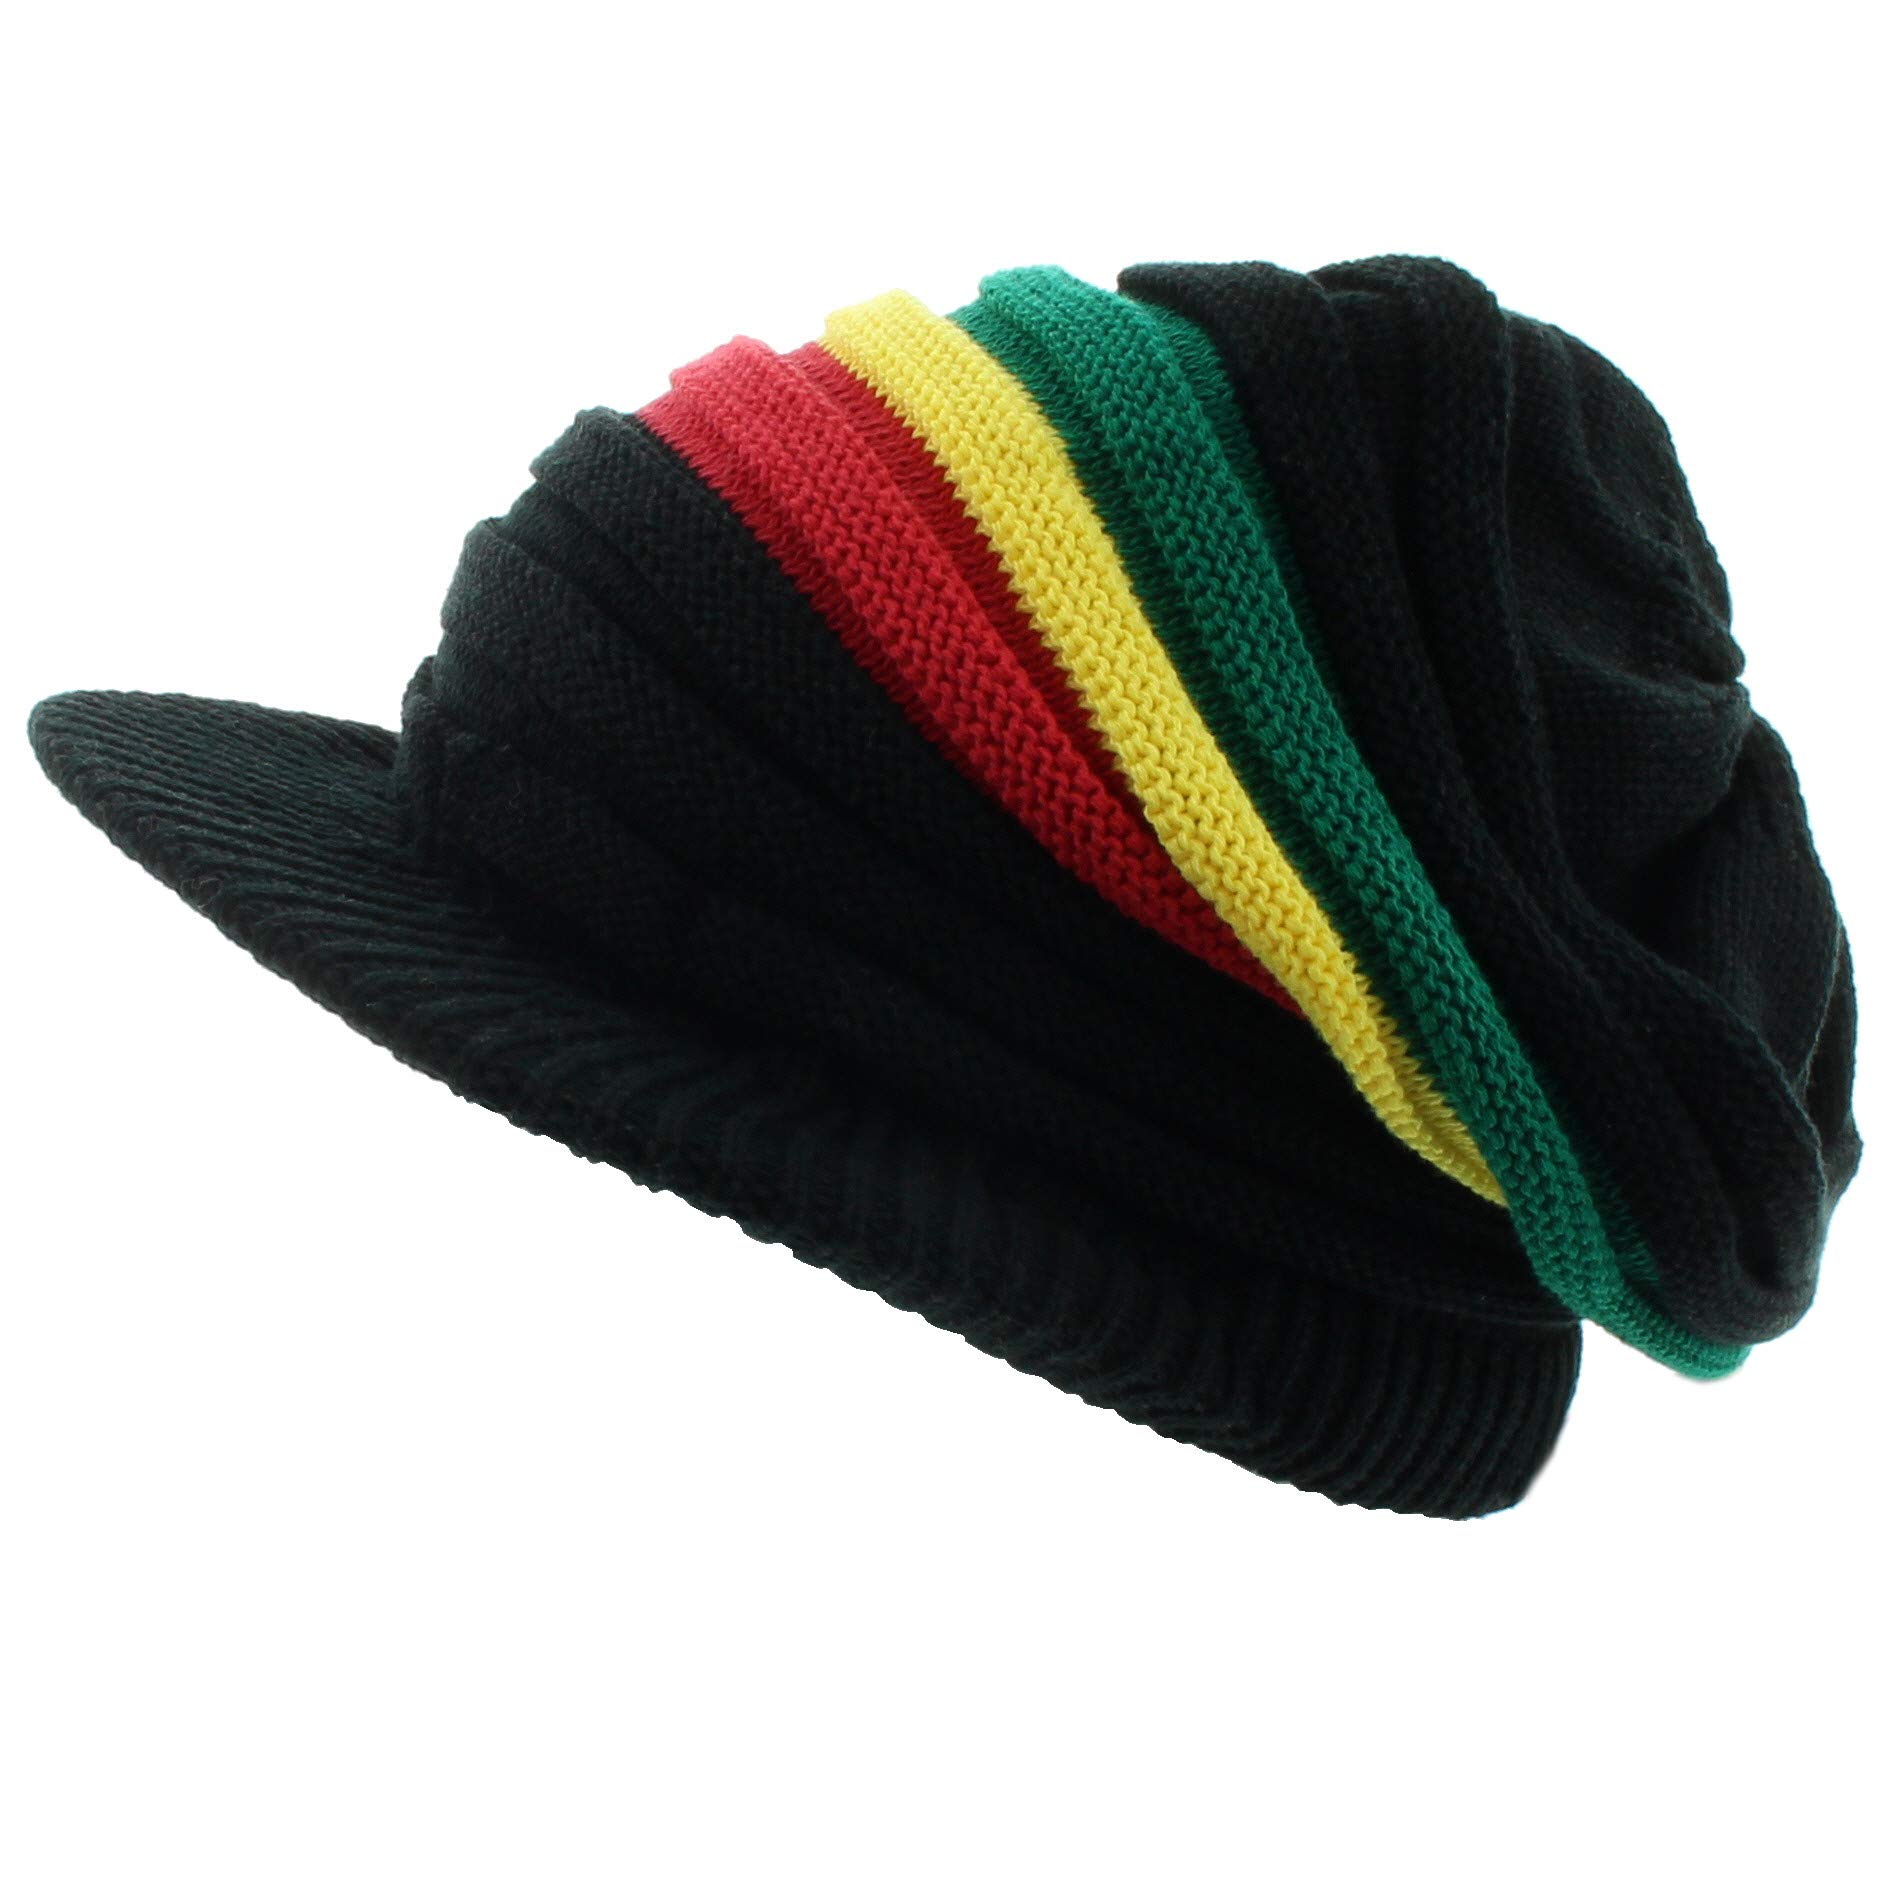 Rasta Ribbed & Slouchy Short Brim Beanie Cap - Cotton and Stripes